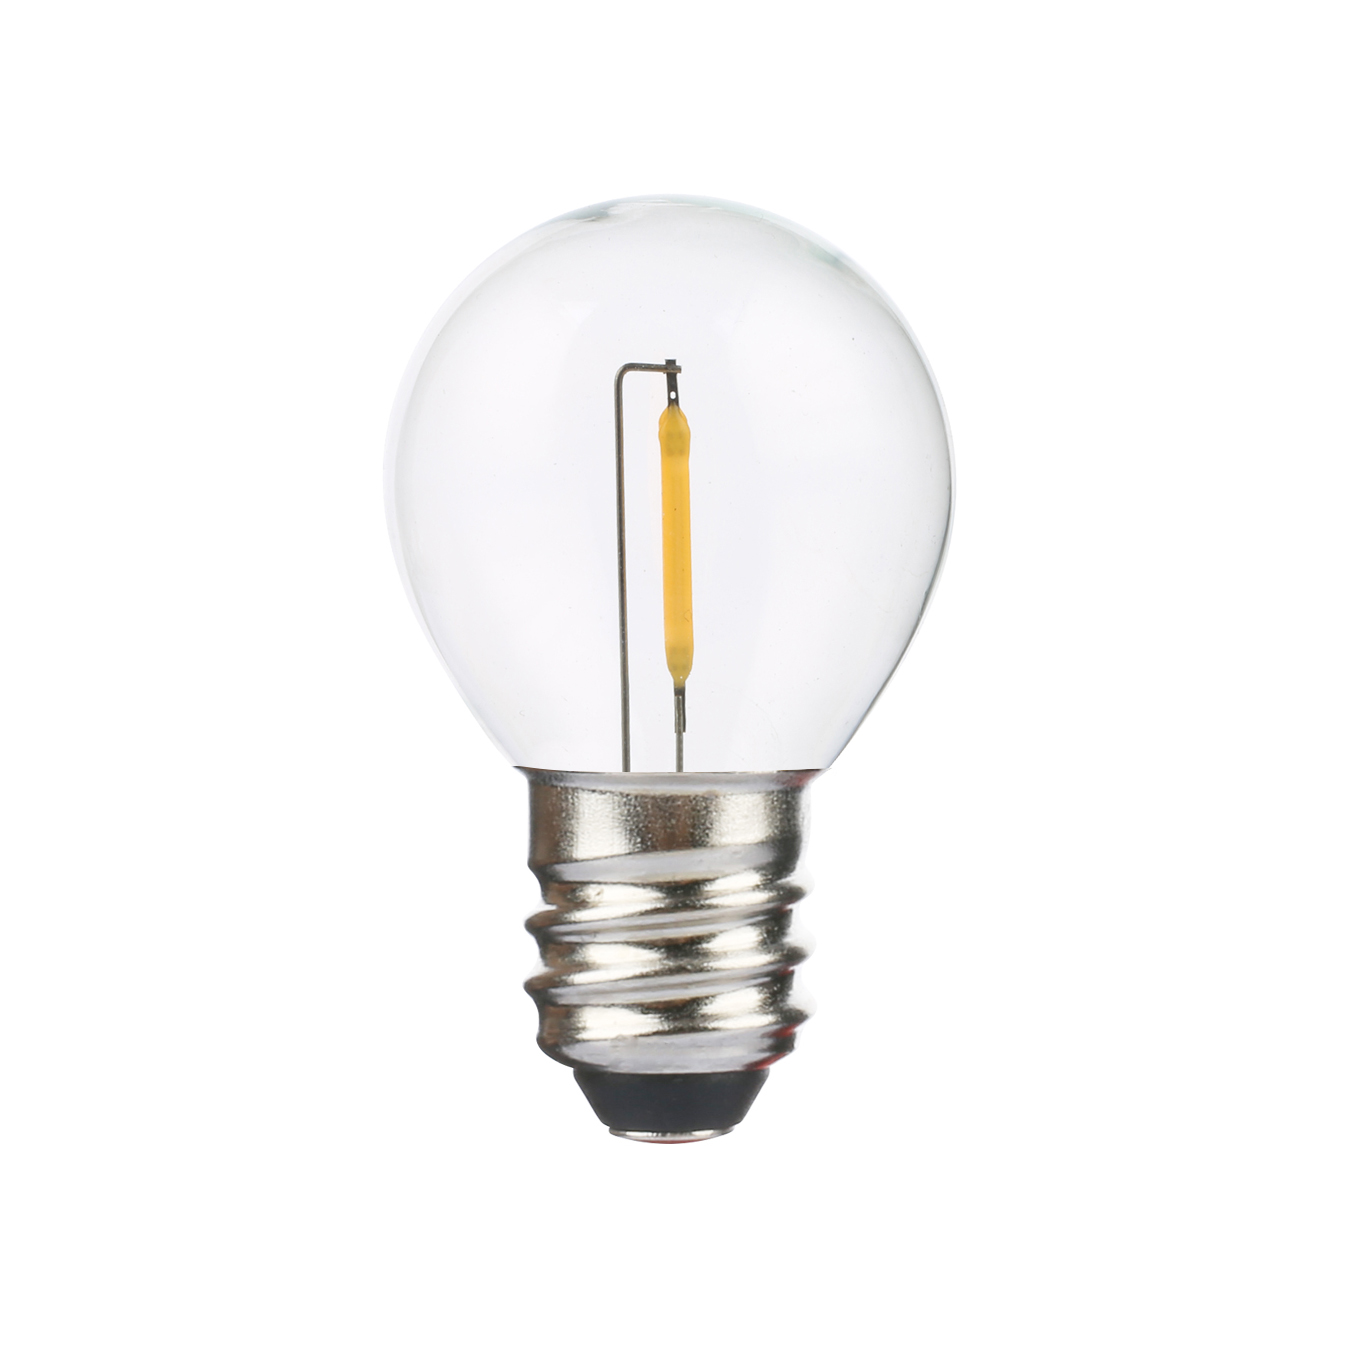 UL Listed G40 E12 LED Filament bulbs